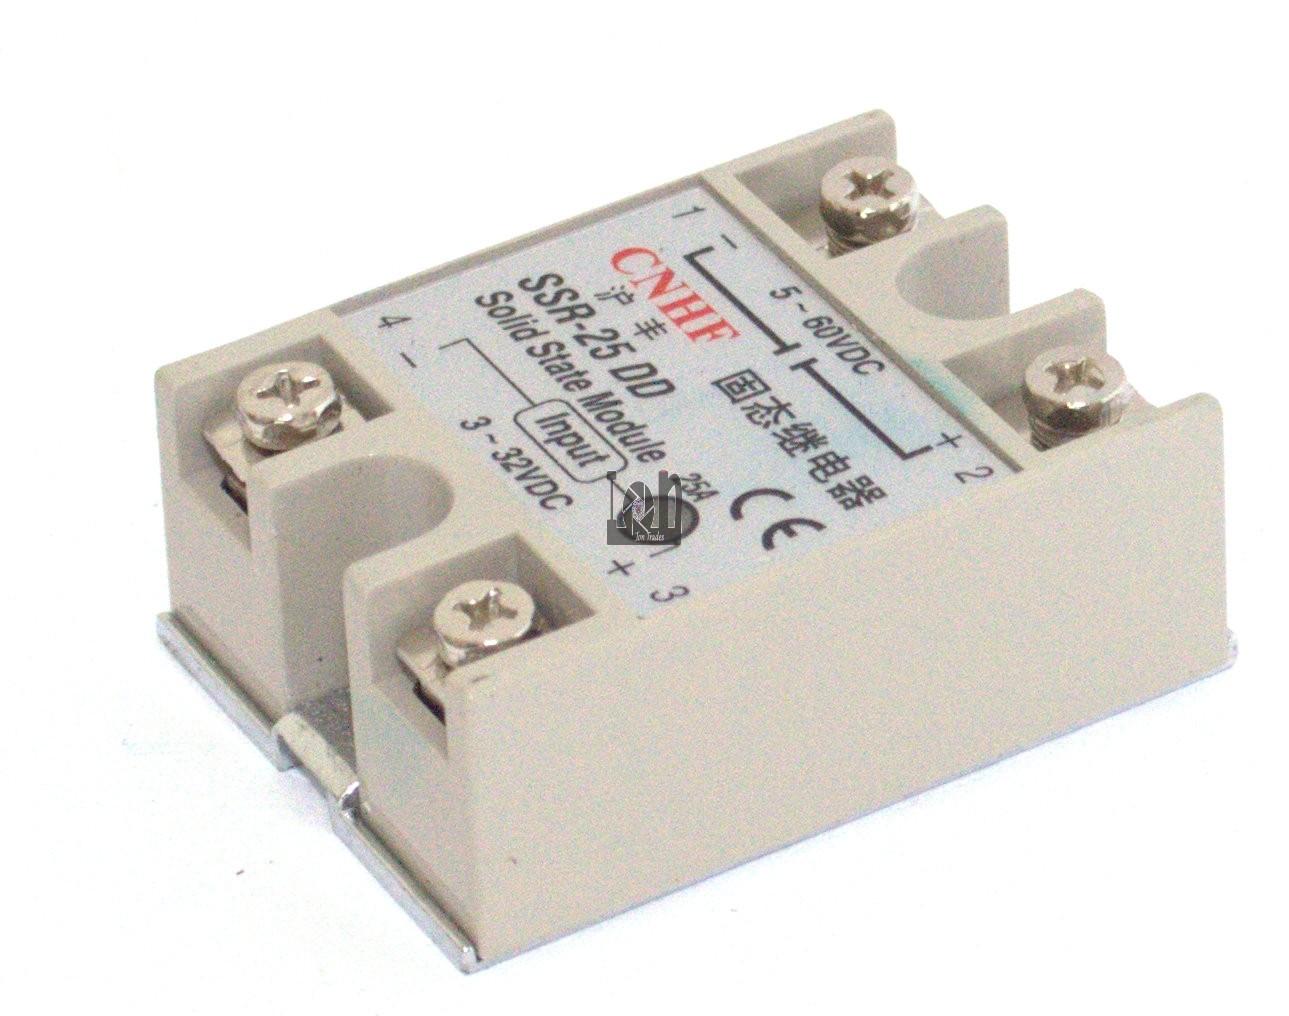 CNHF SSR-25 DD Solid State Module Relay